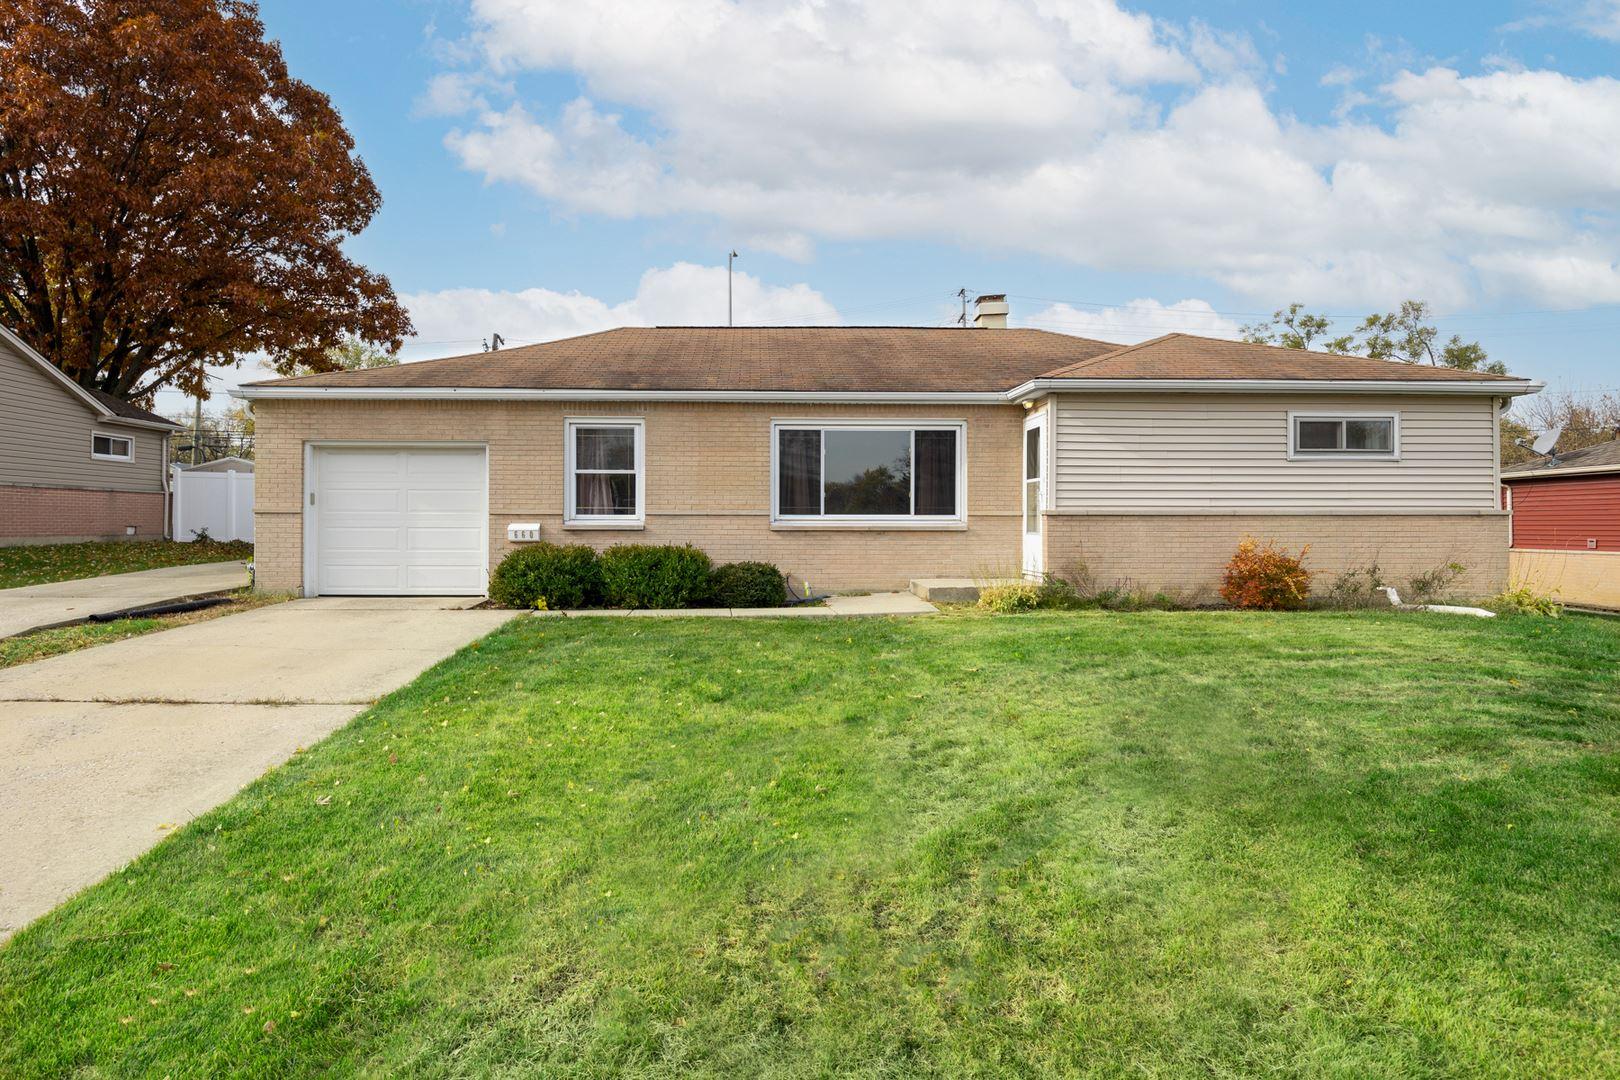 660 Cumberland Street, Hoffman Estates, IL 60169 - #: 11244446